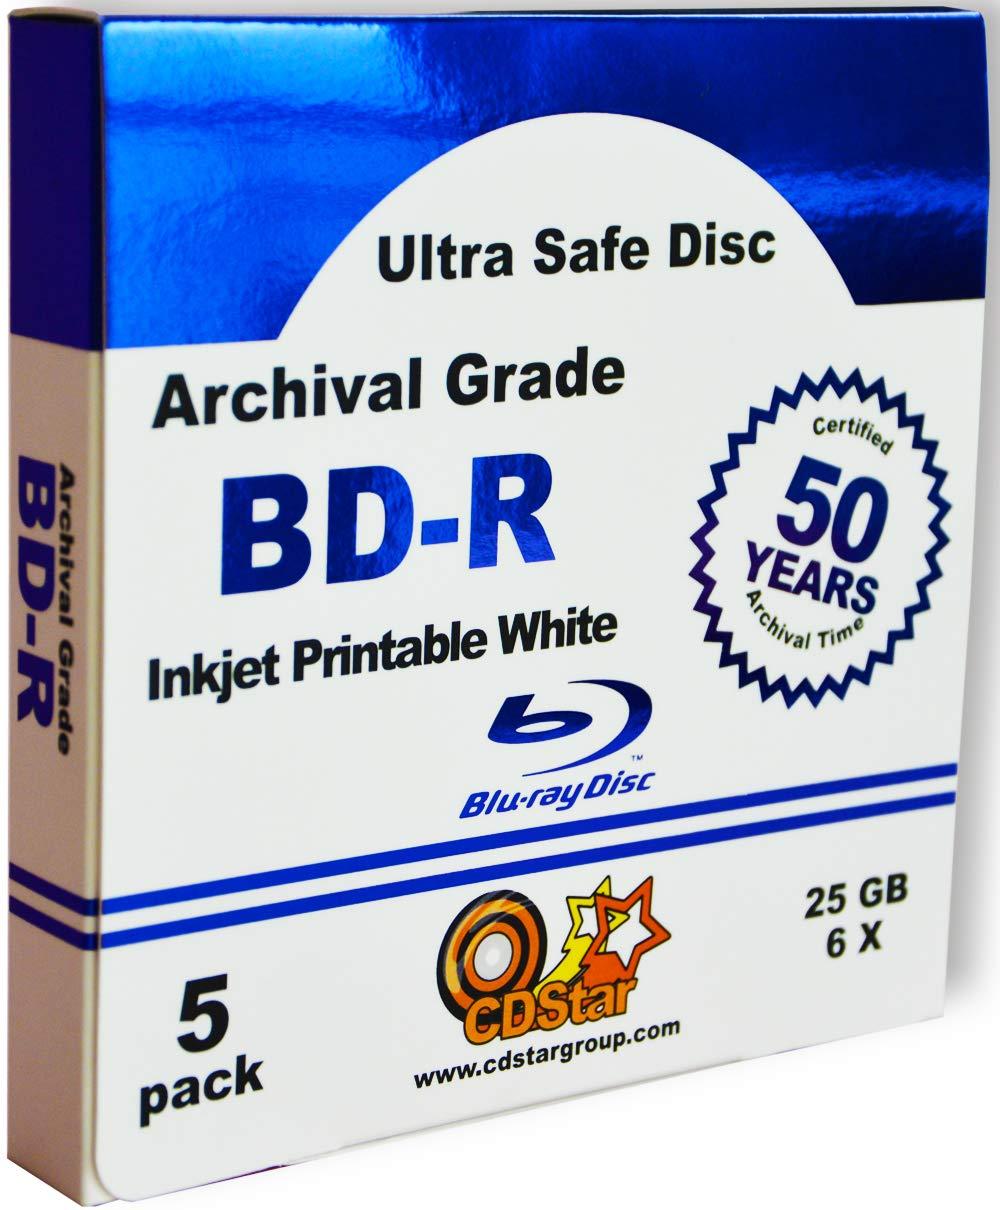 Ultra Safe Disc Archival Grade Printable inkjet shining blu pack 5 pcs CD Star Blu Ray 25 Gb 50 year archival guarantee